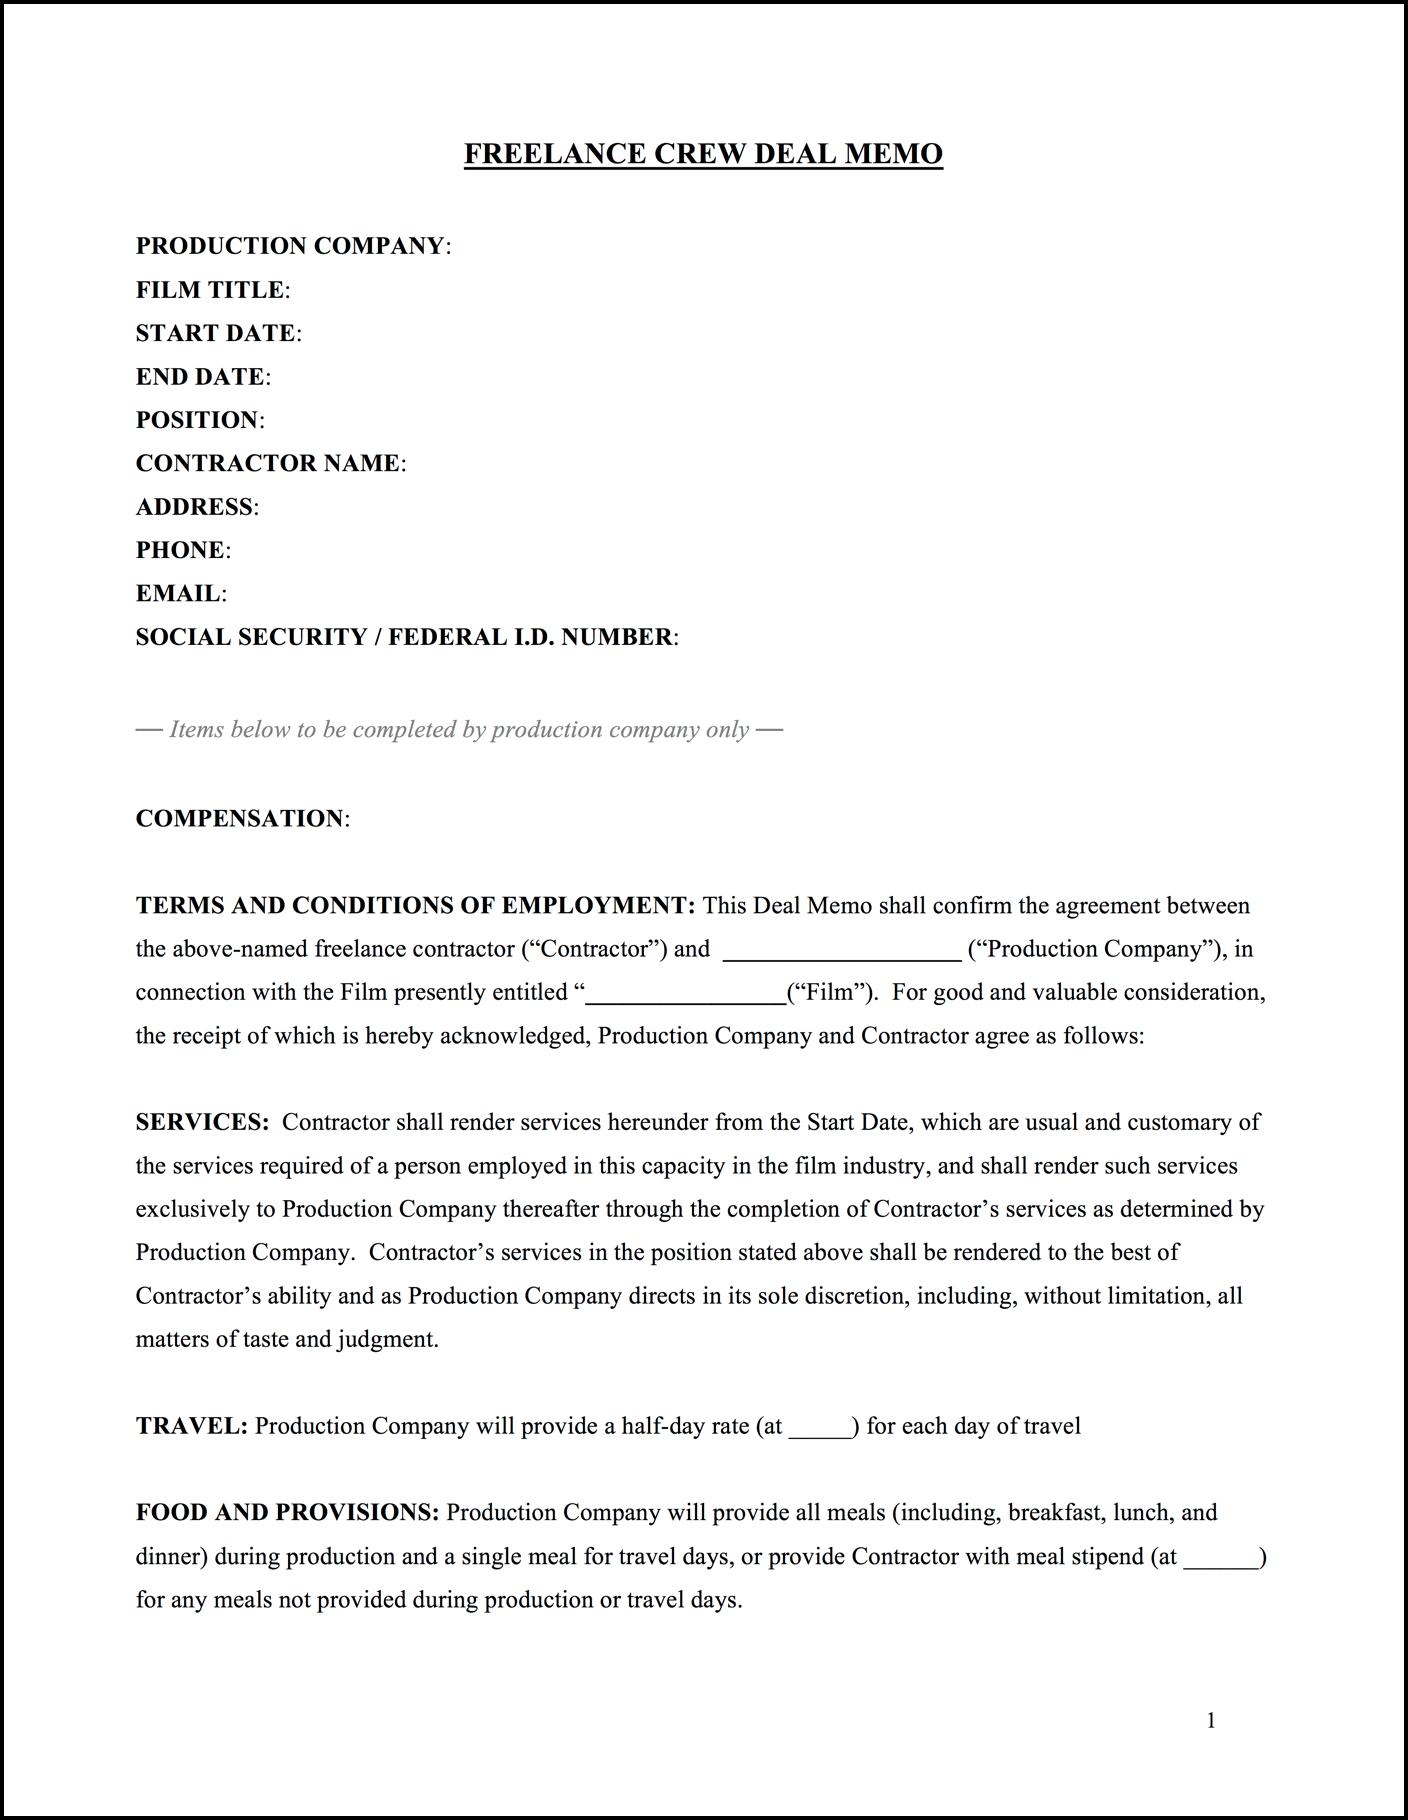 Freelance Crew Deal Memo Template -1 - StudioBinder